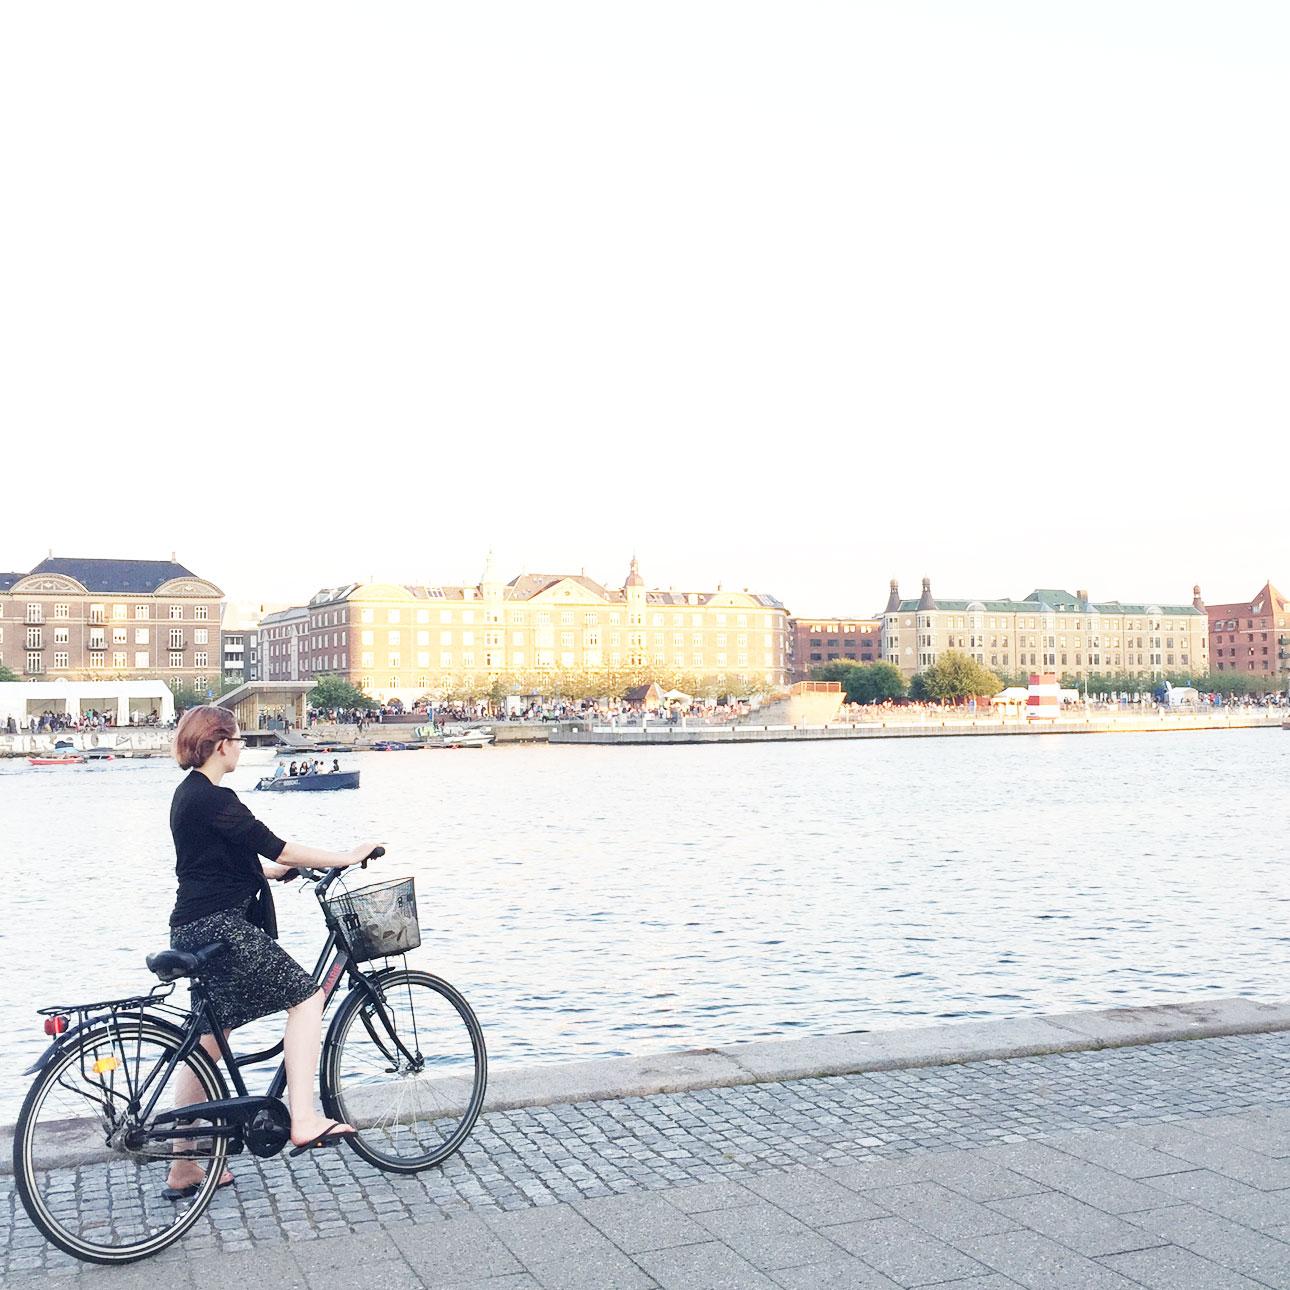 Kopenhagen hotspots - Marike Bijlsma